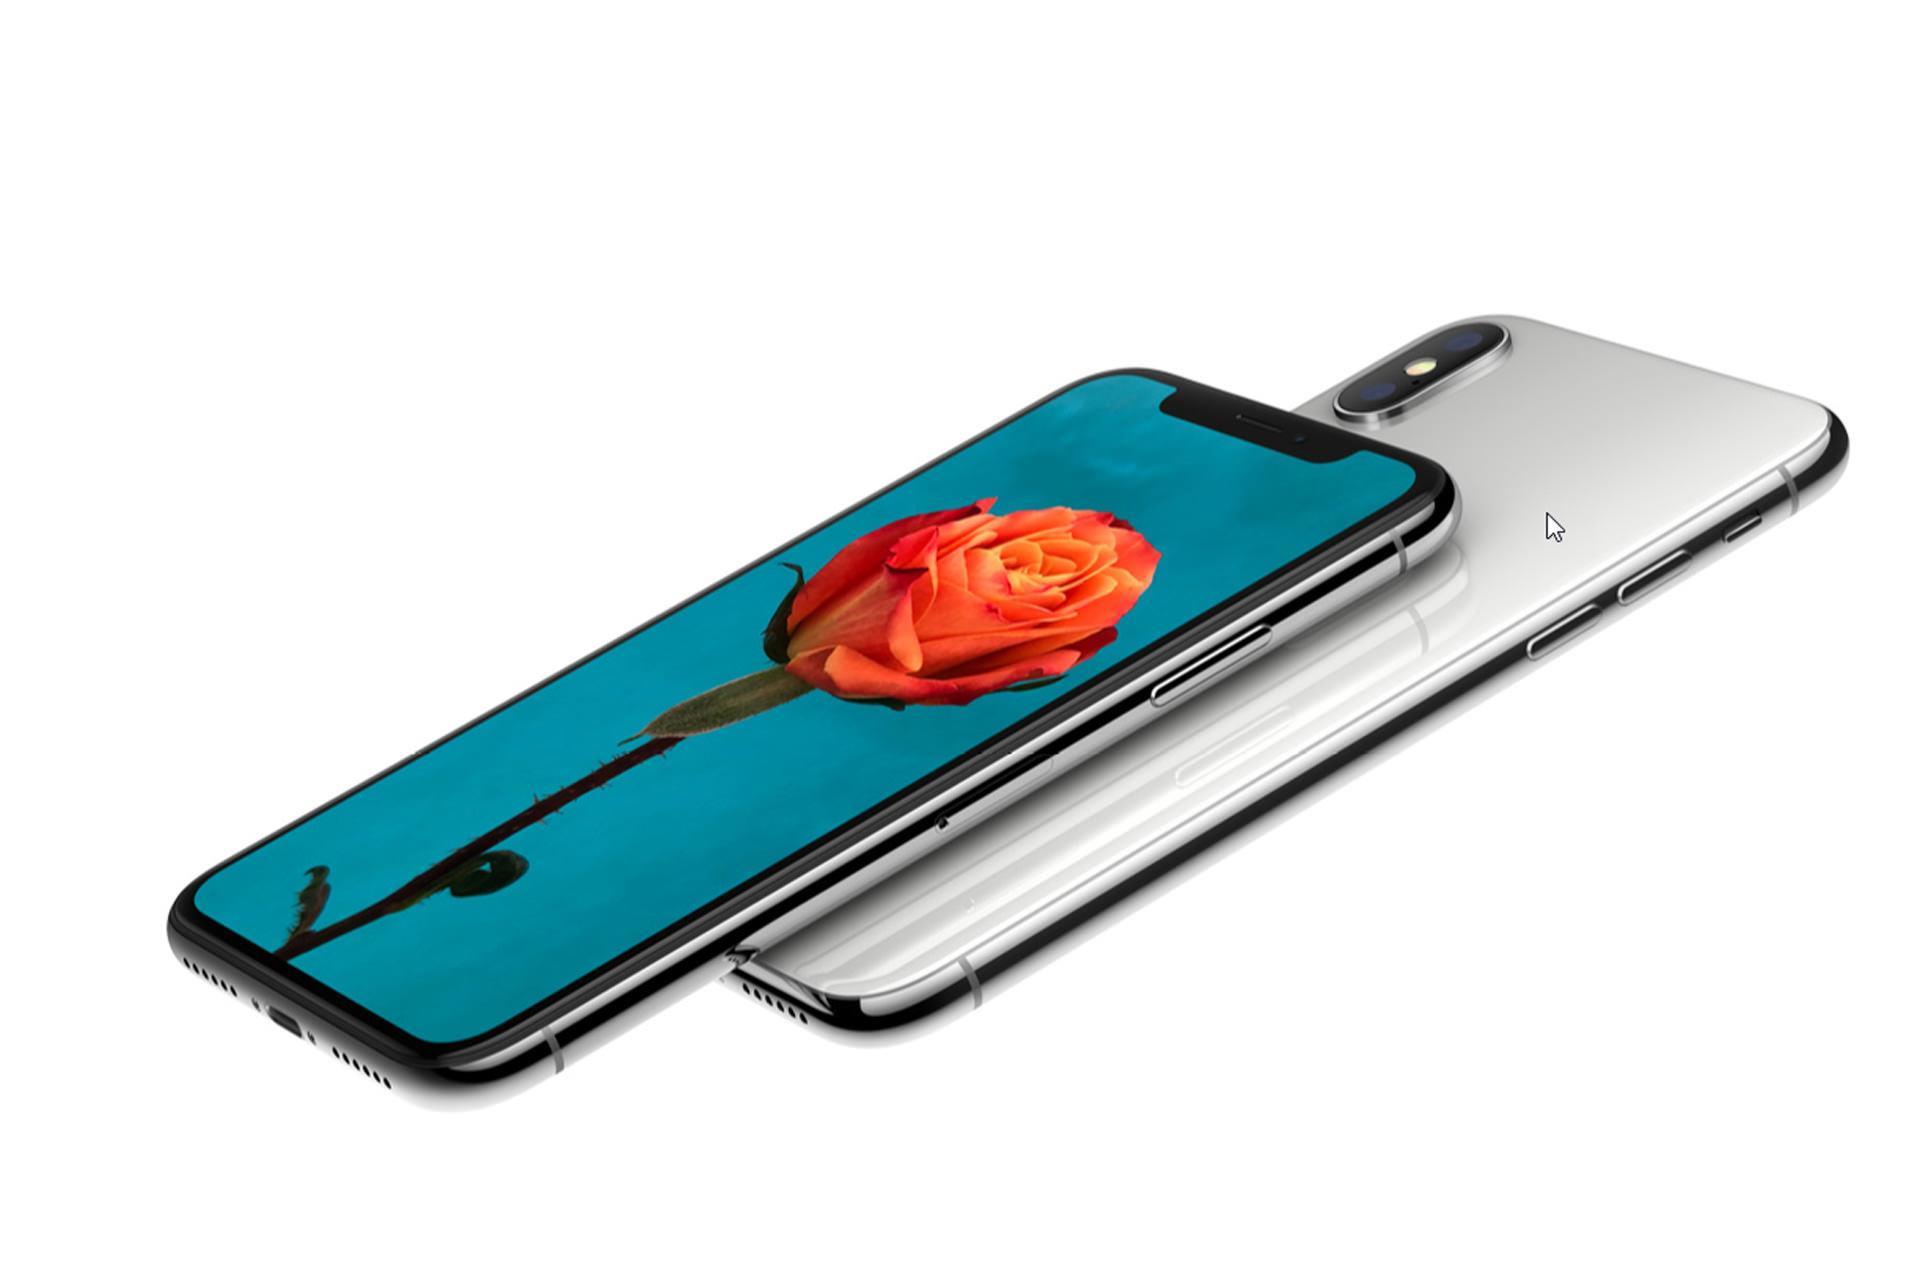 آیفون ایکس (iPhone 10) تلفیقی از هنر مد و تکنولوژی